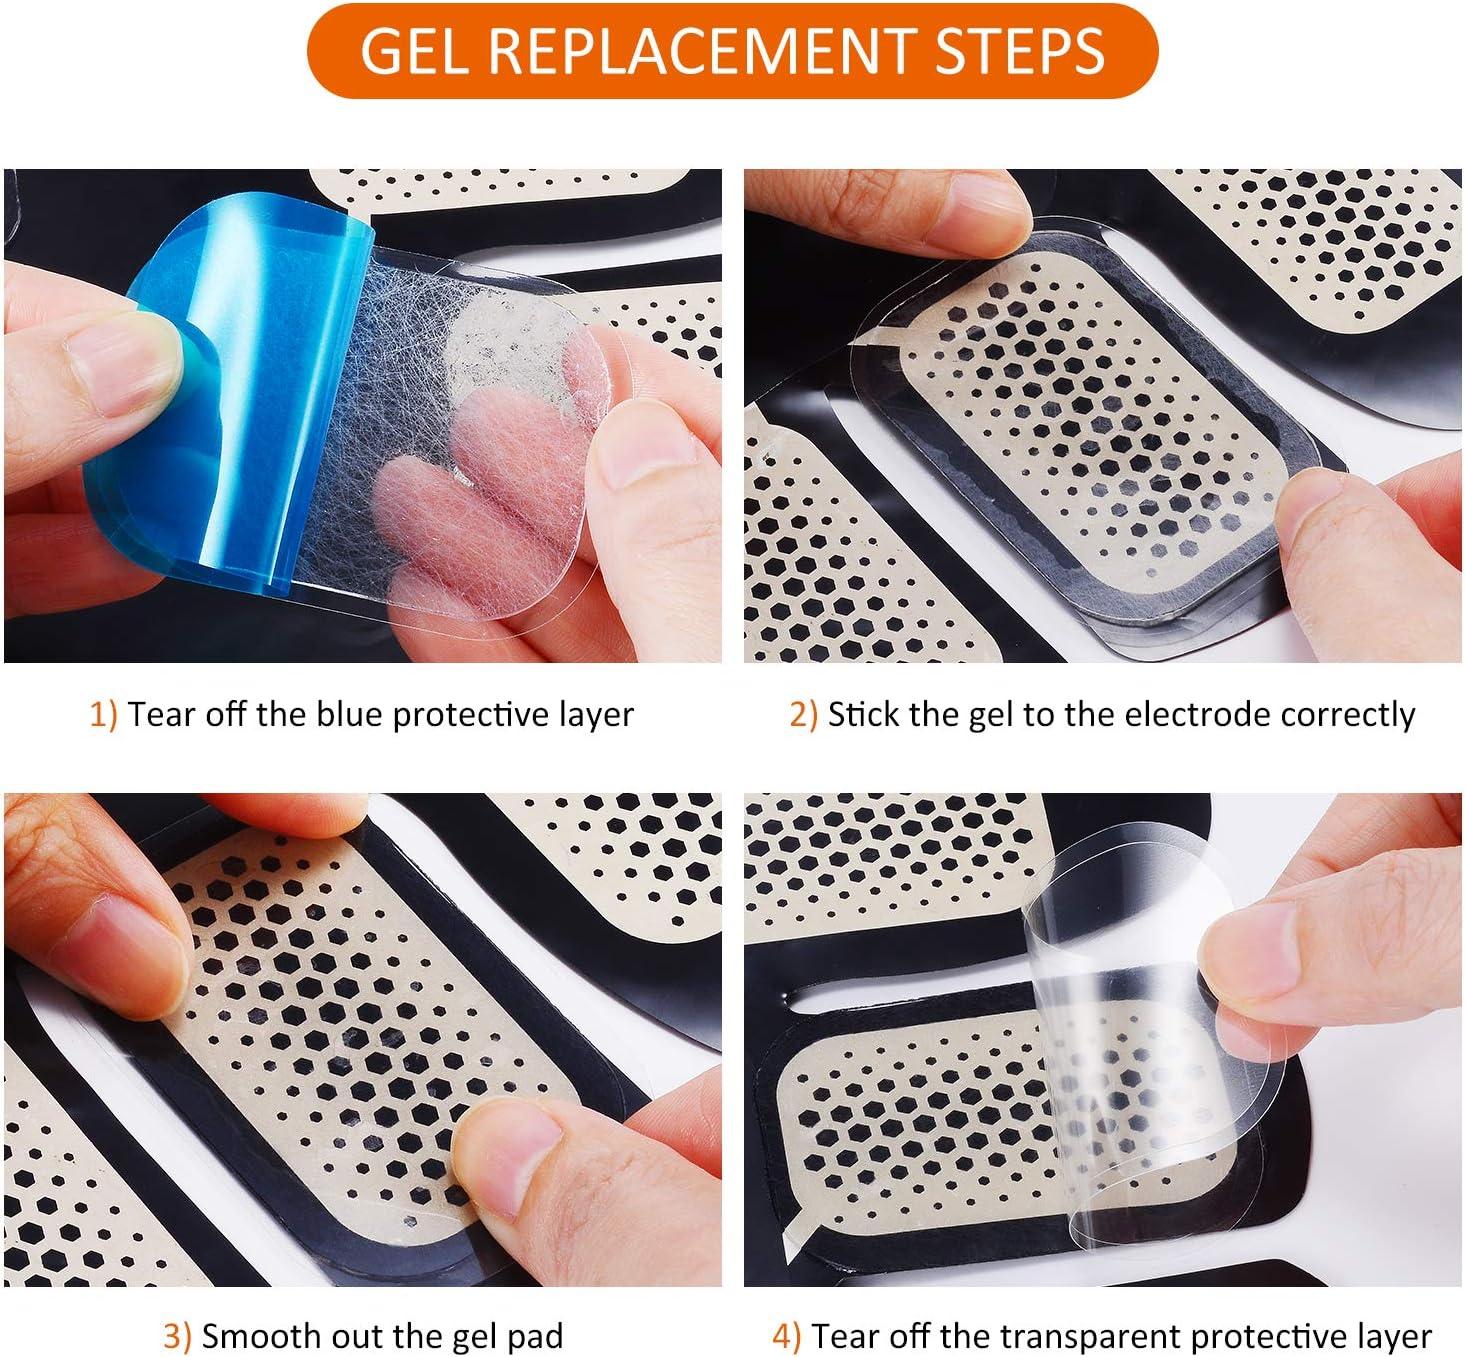 UYGHHK 72 Pcs//36 Pack Gel Pads for Abs Stimulator Ab Trainer Replacement Gel Sheet for EMS AB Stimulator Gel Pad for All Abdominal Belts Muscle Stimulator Ab Toner